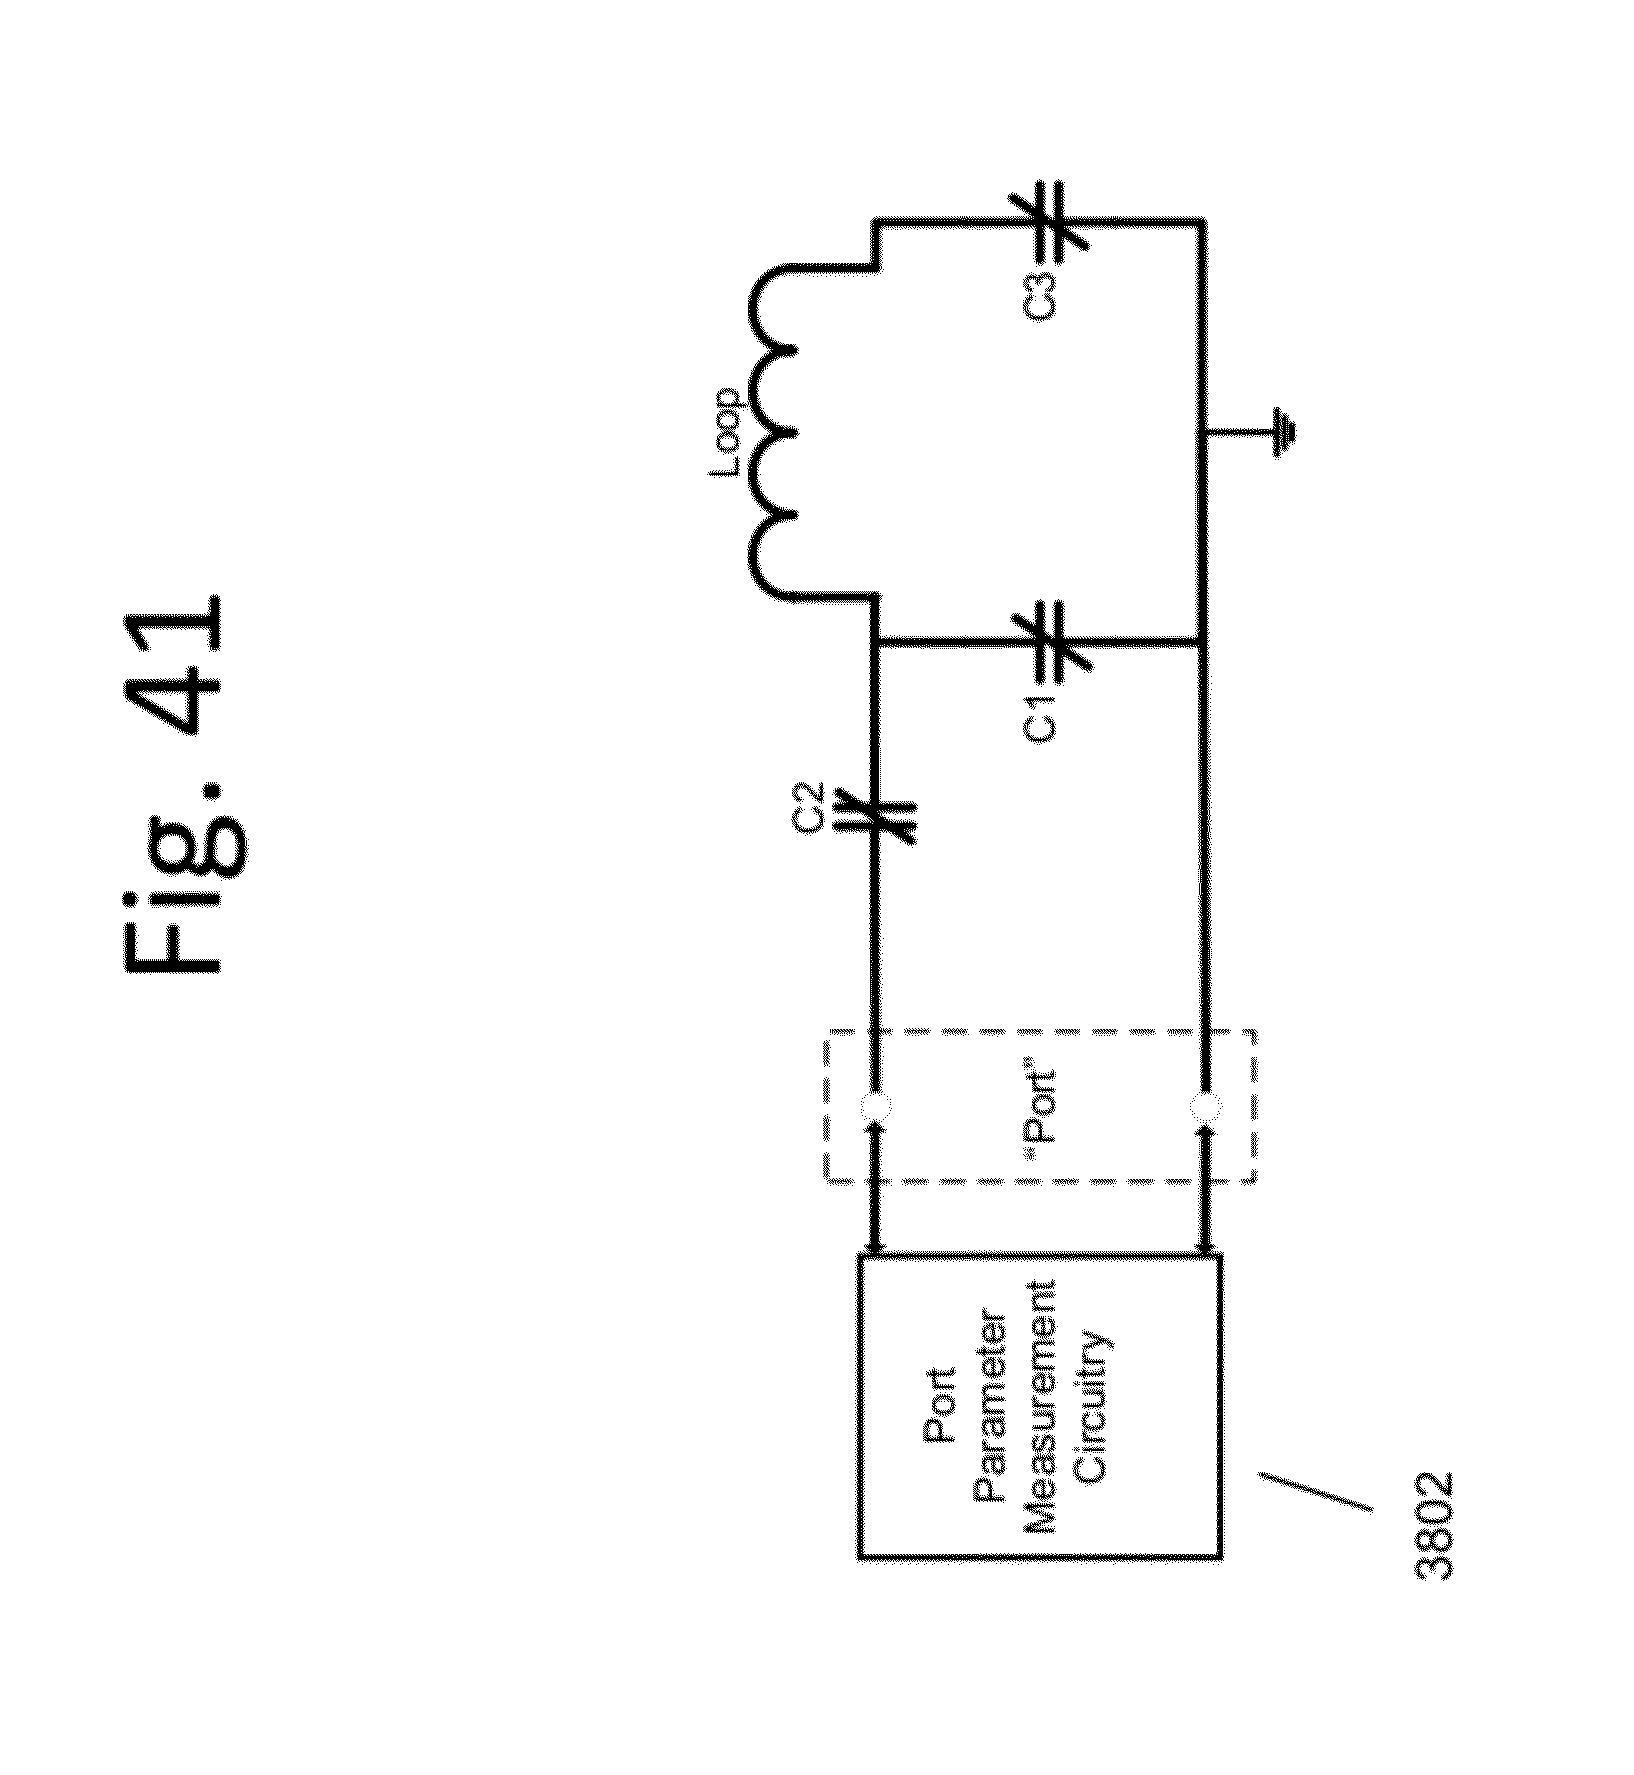 855t Bpm10 Wiring Diagram : 25 Wiring Diagram Images